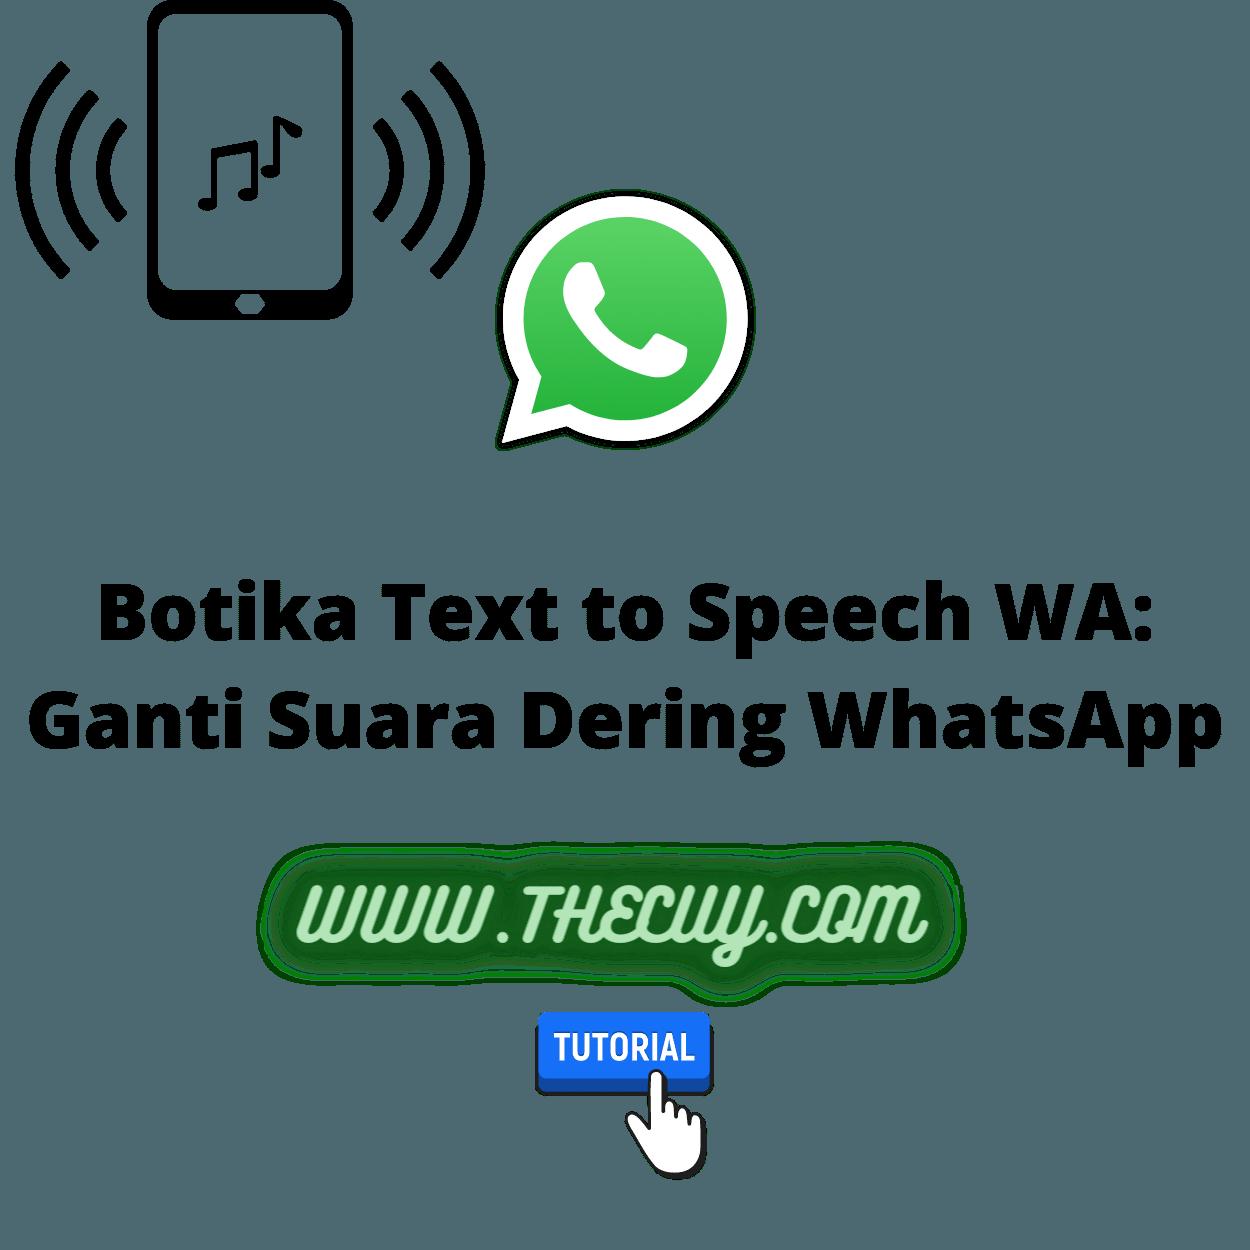 Botika Text to Speech WA: Ganti Suara Dering WhatsApp